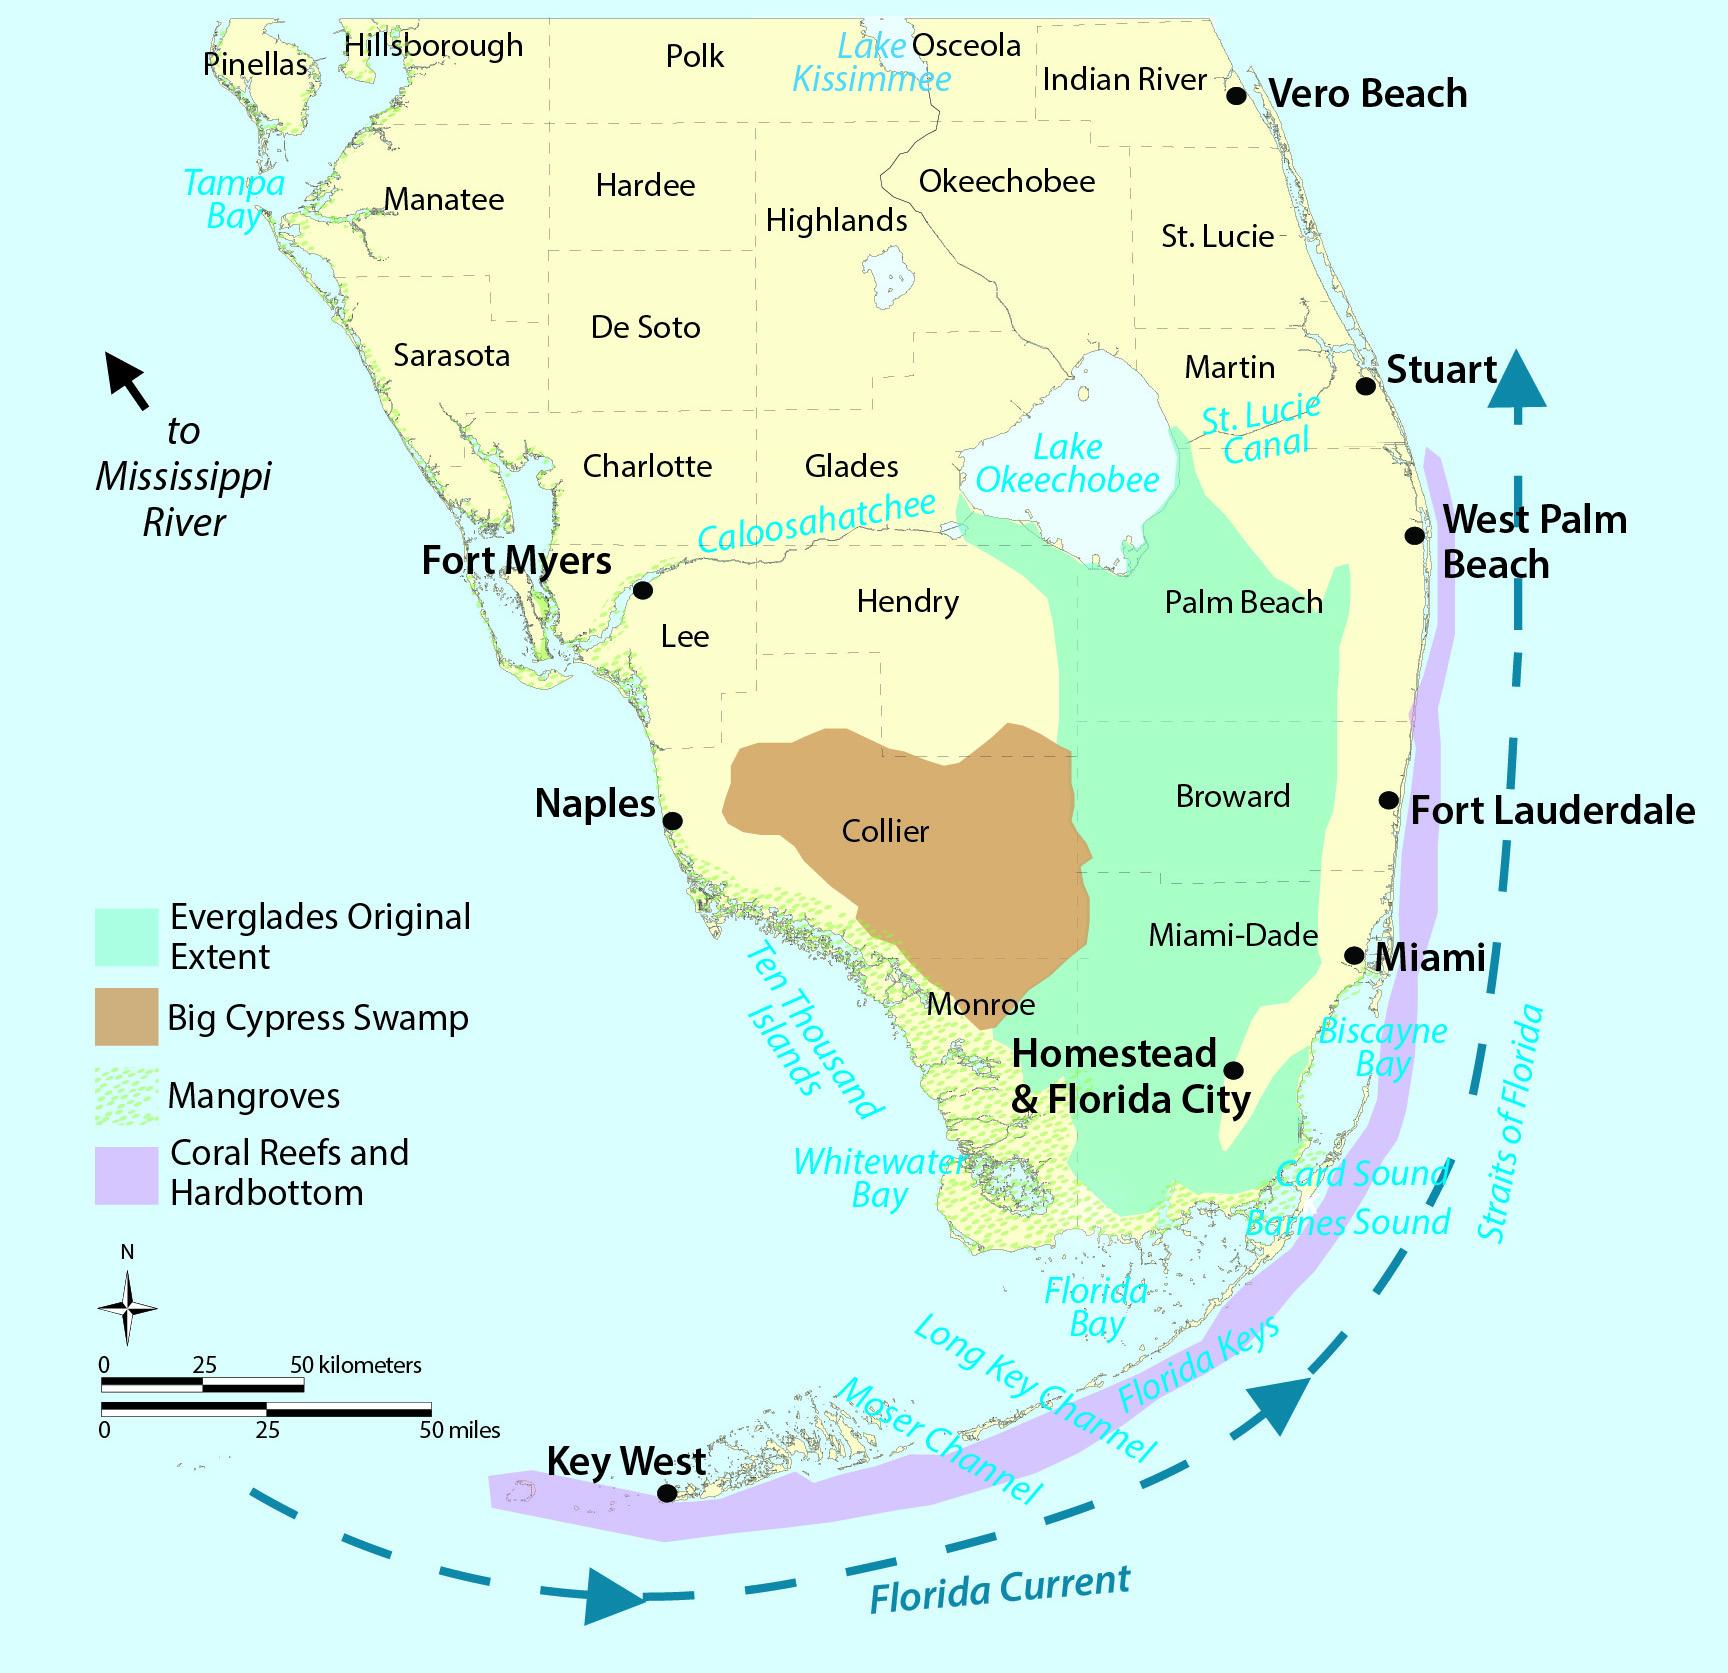 Ocean acidification in south florida aksik for Fishing jobs in florida